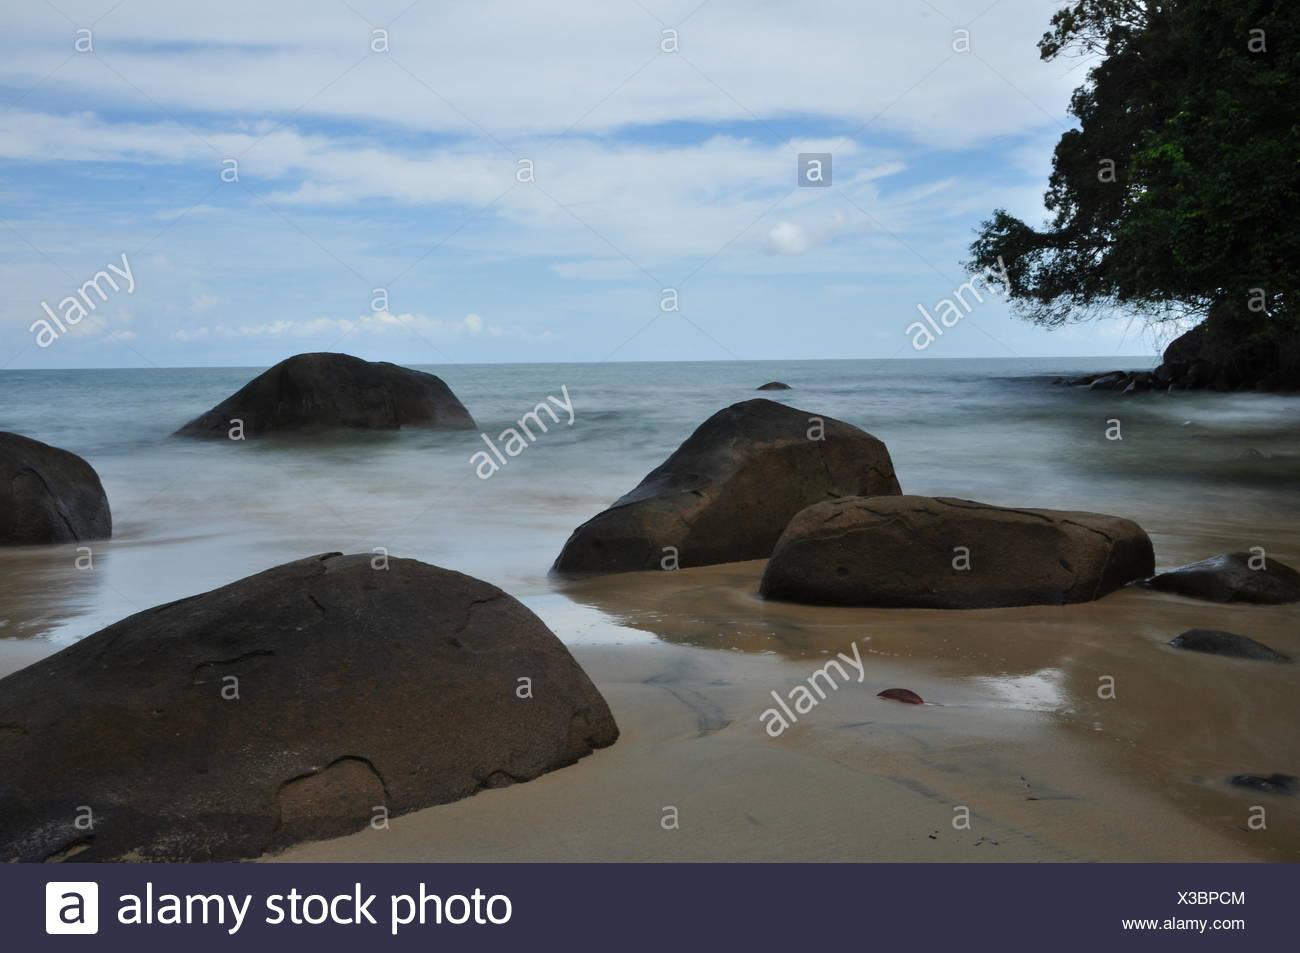 stones at small sandy beach - Stock Image